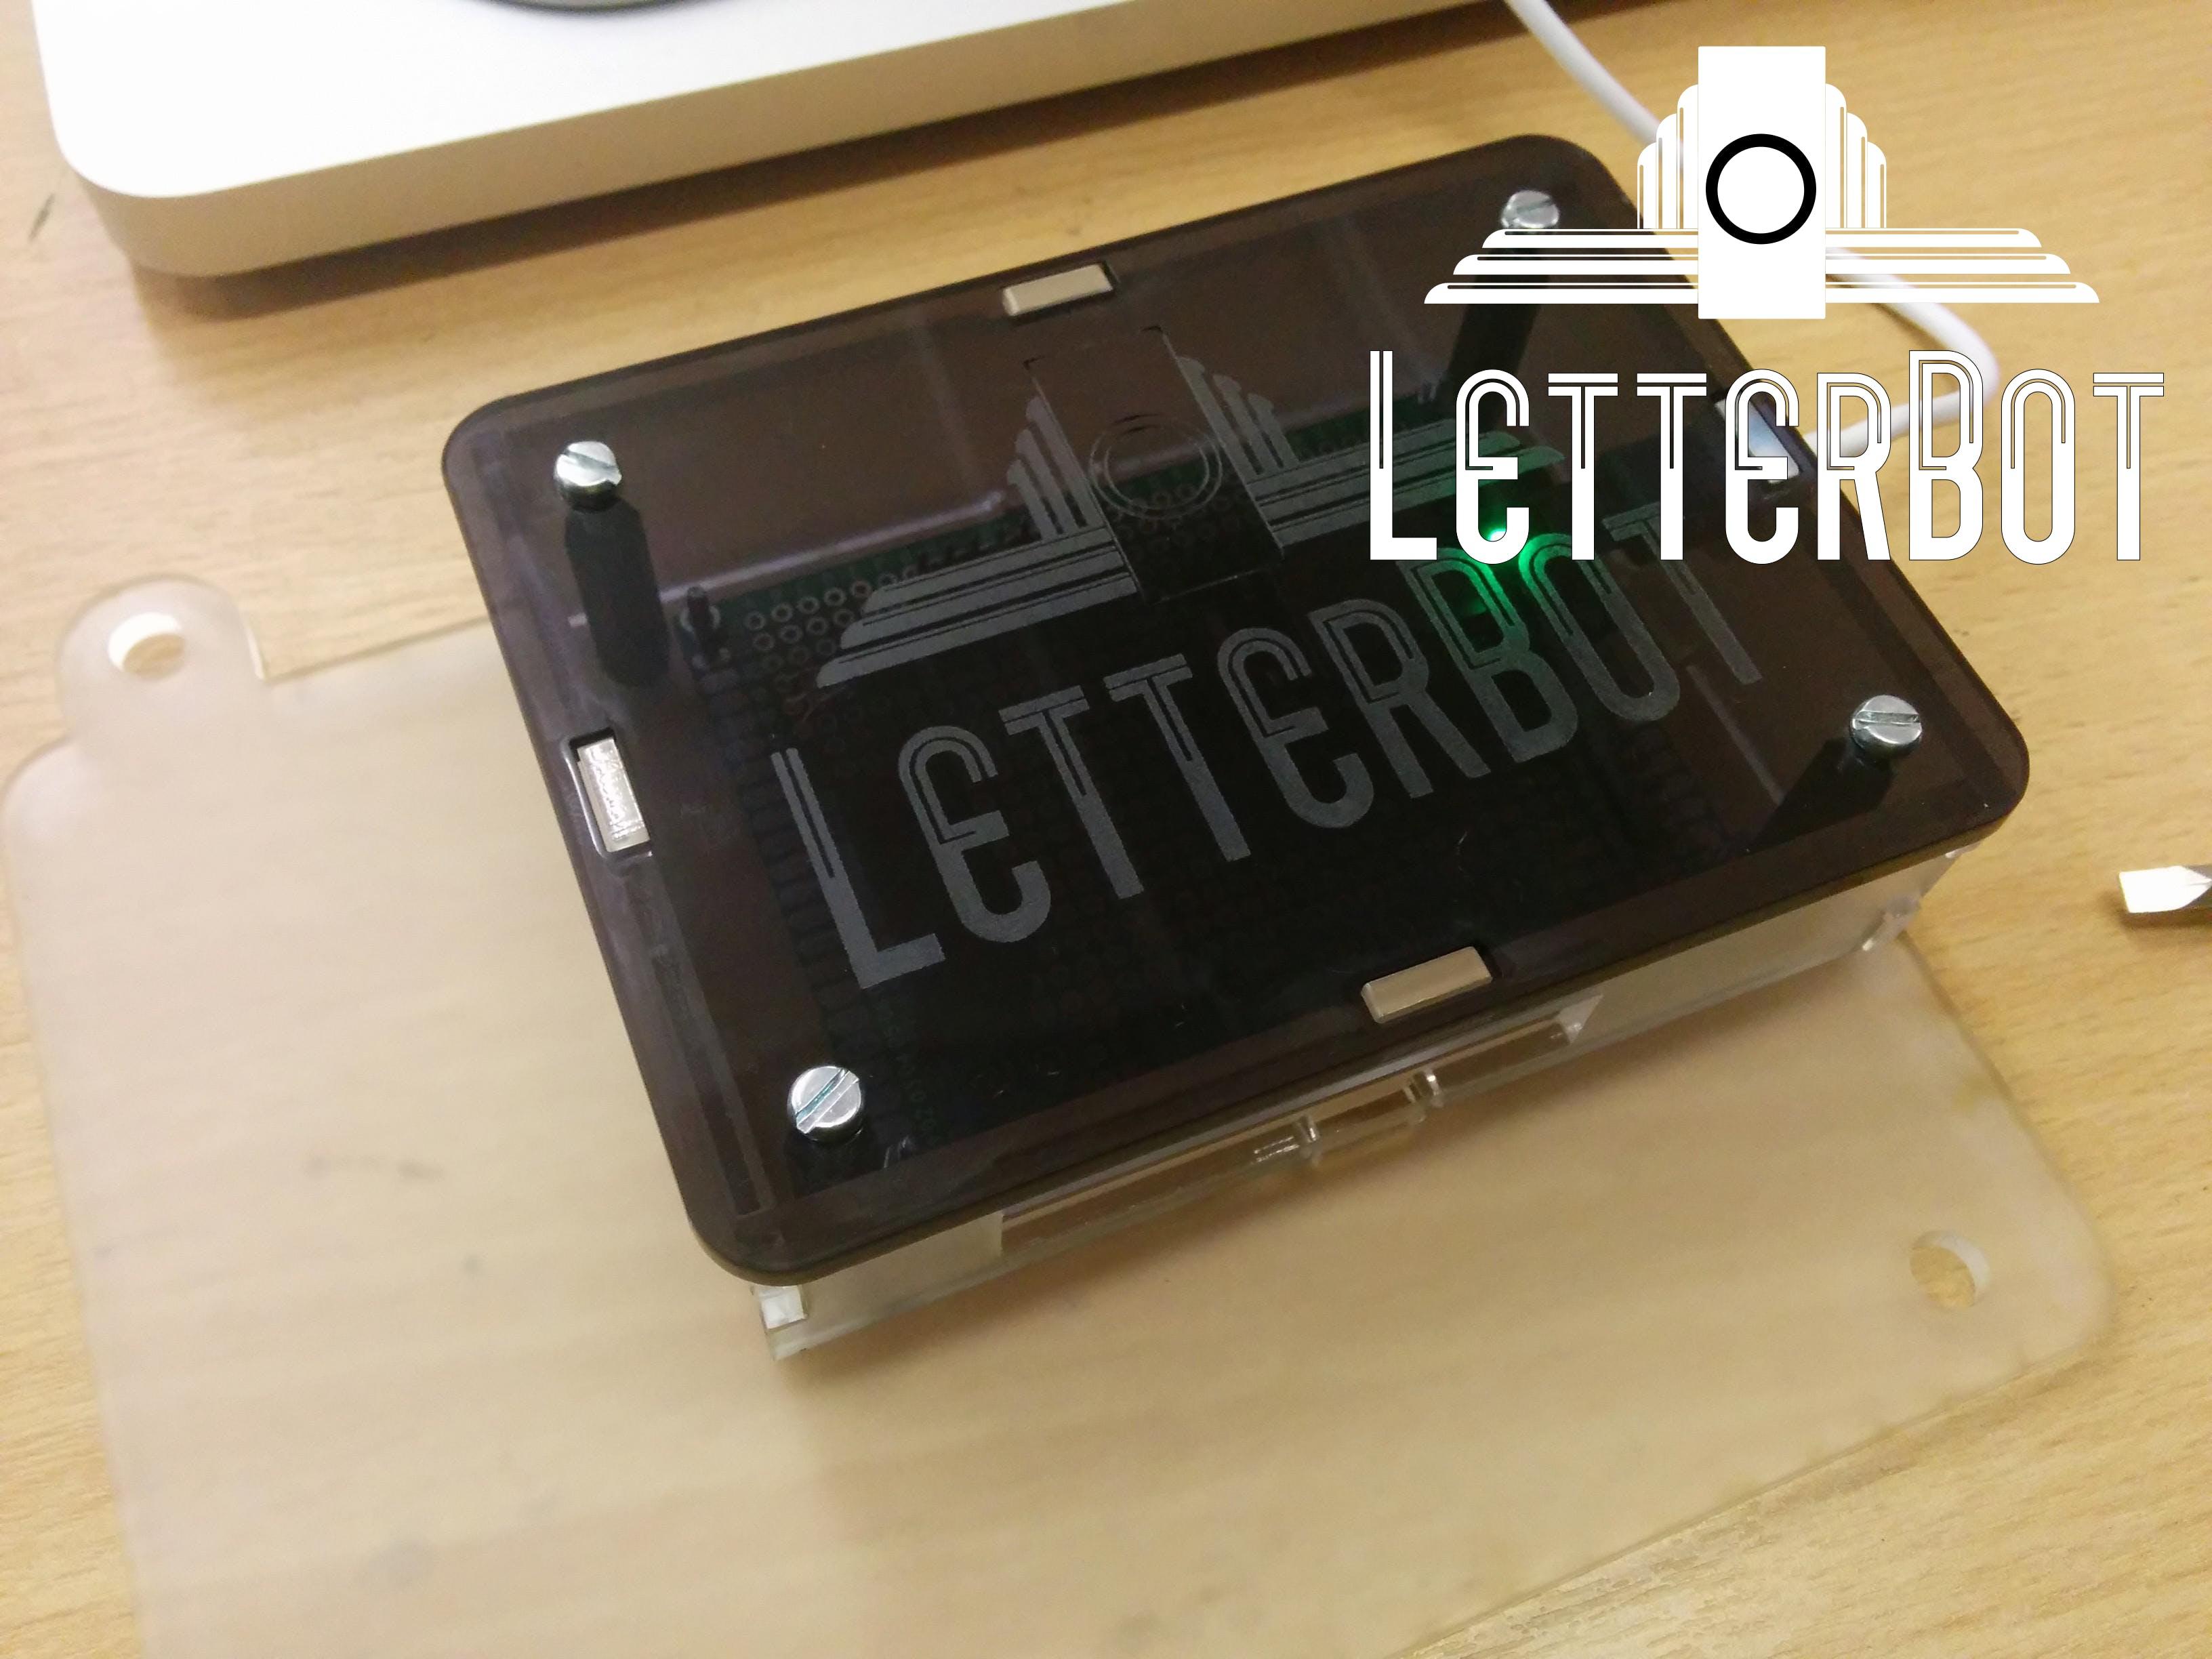 LetterBot